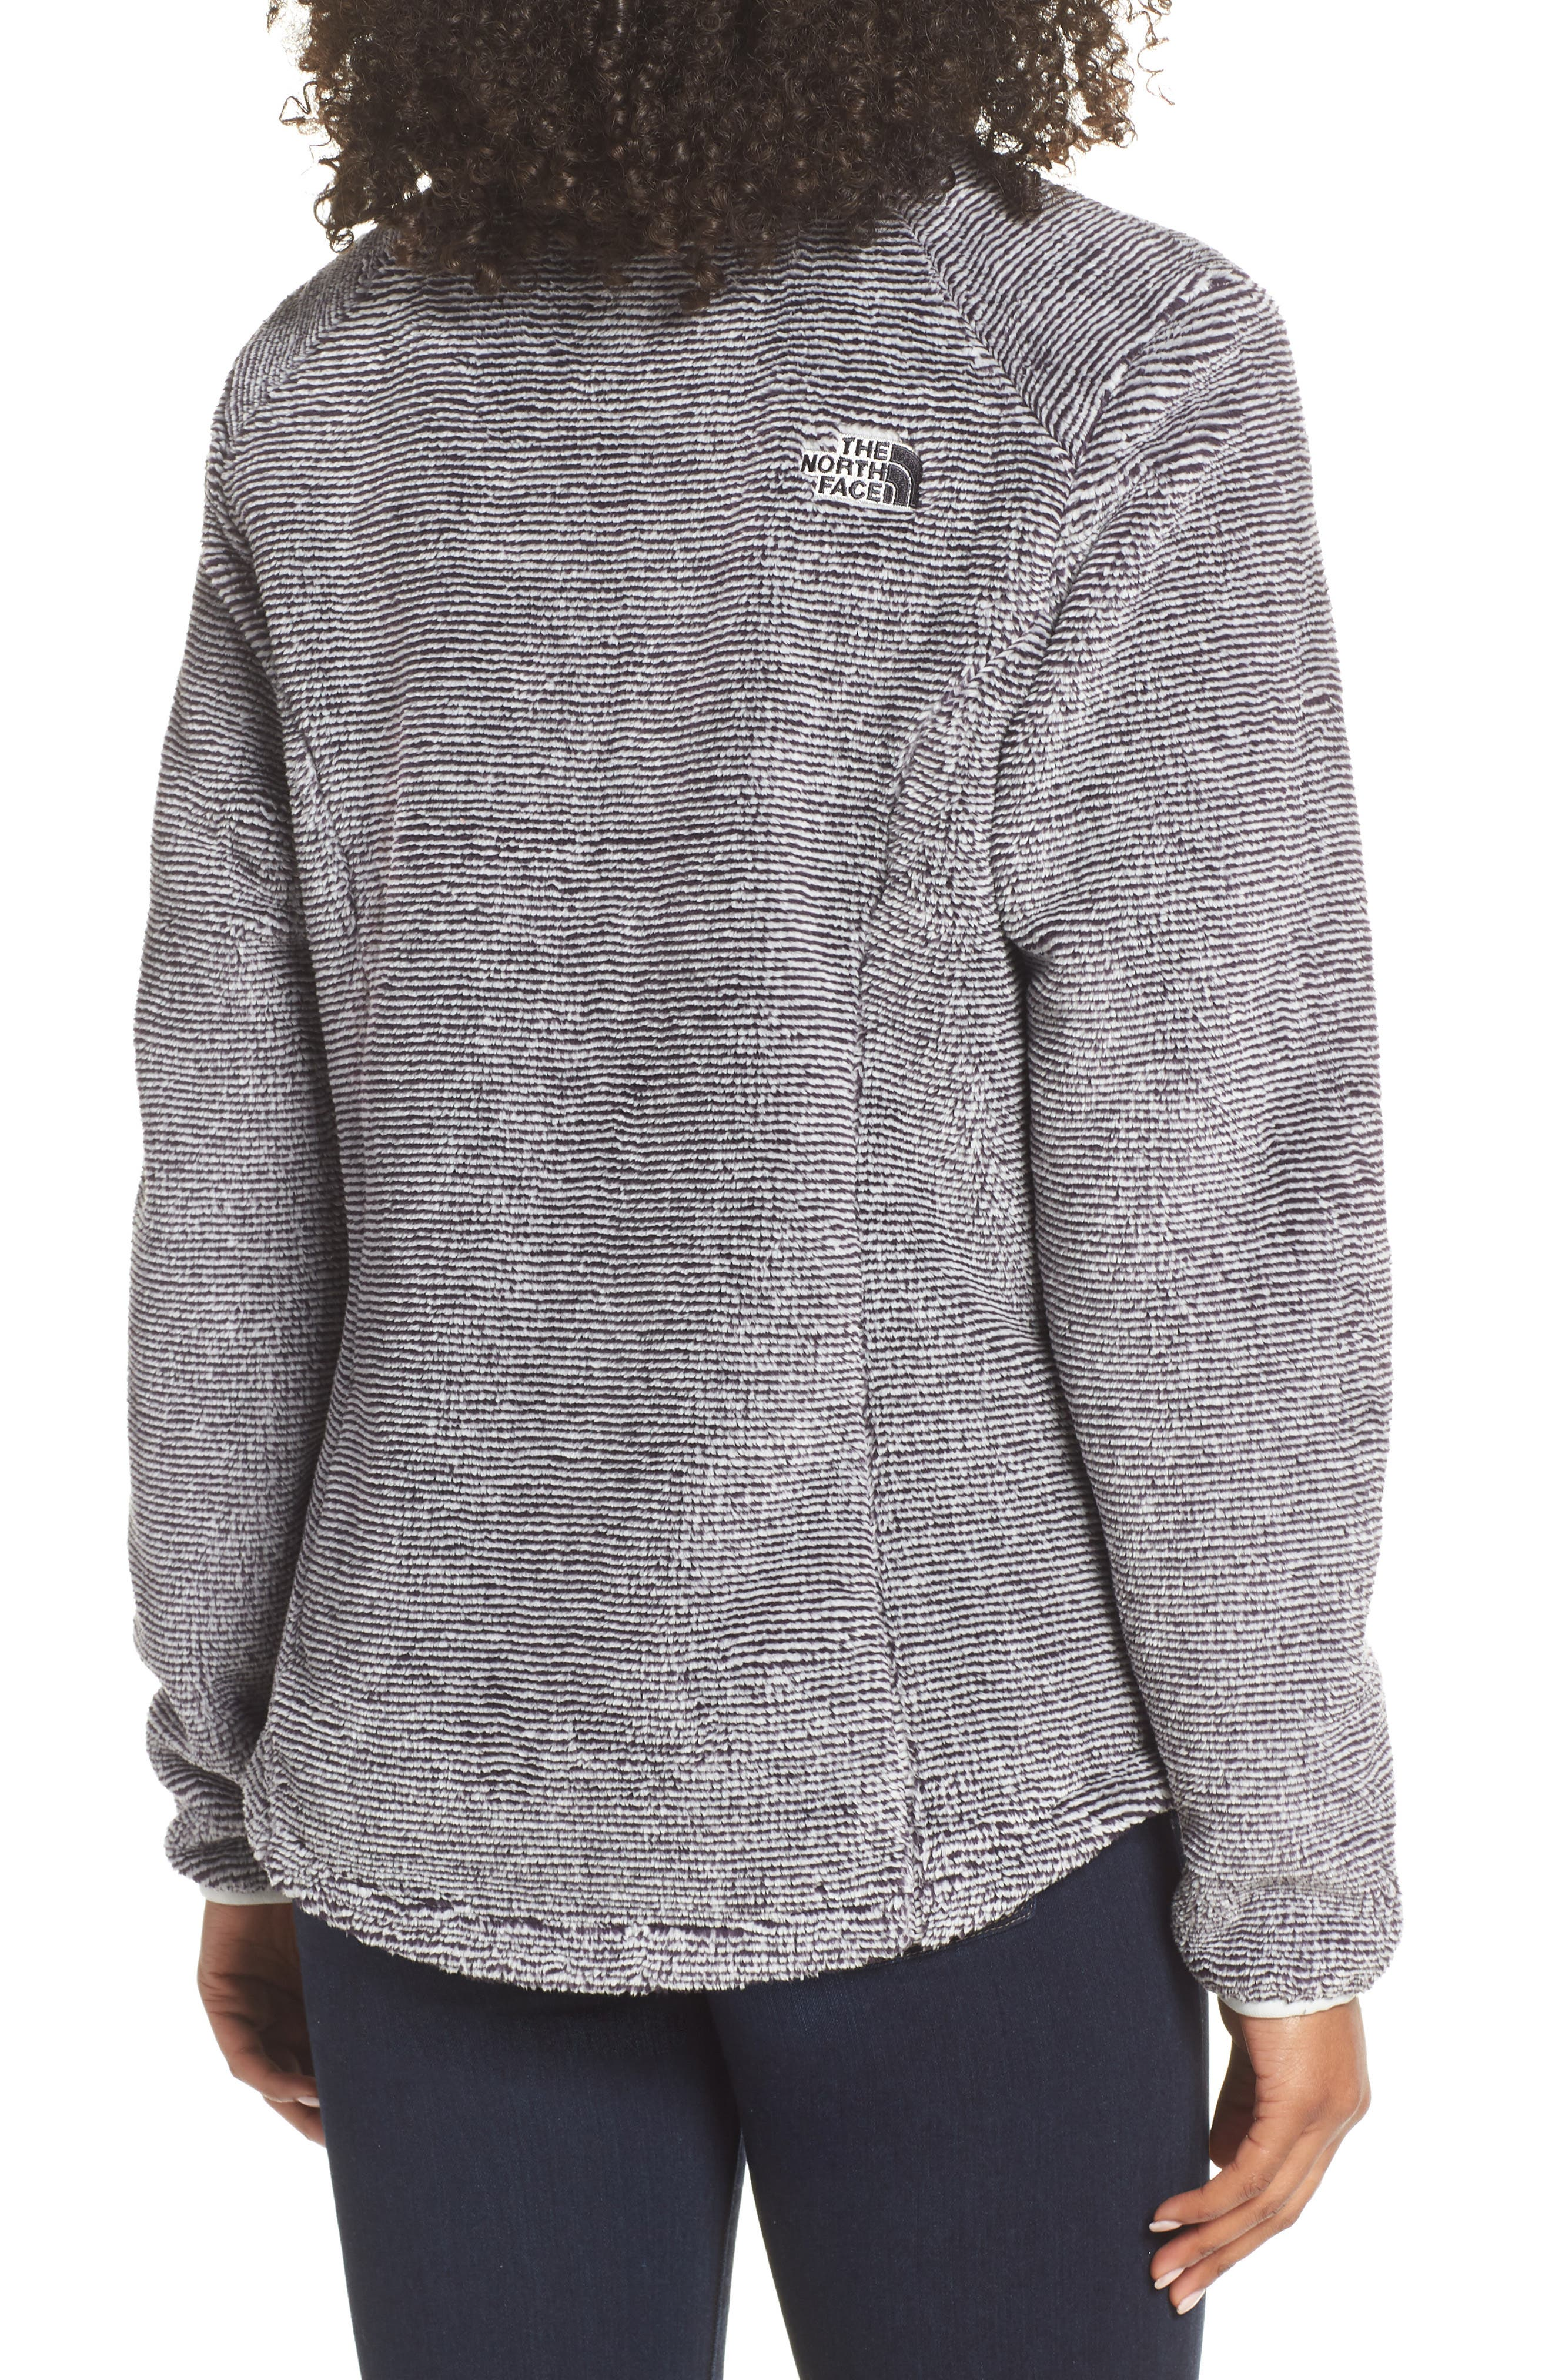 THE NORTH FACE, Osito 2 Stripe Fleece Jacket, Alternate thumbnail 2, color, BLACK/ TIN GREY STRIPE